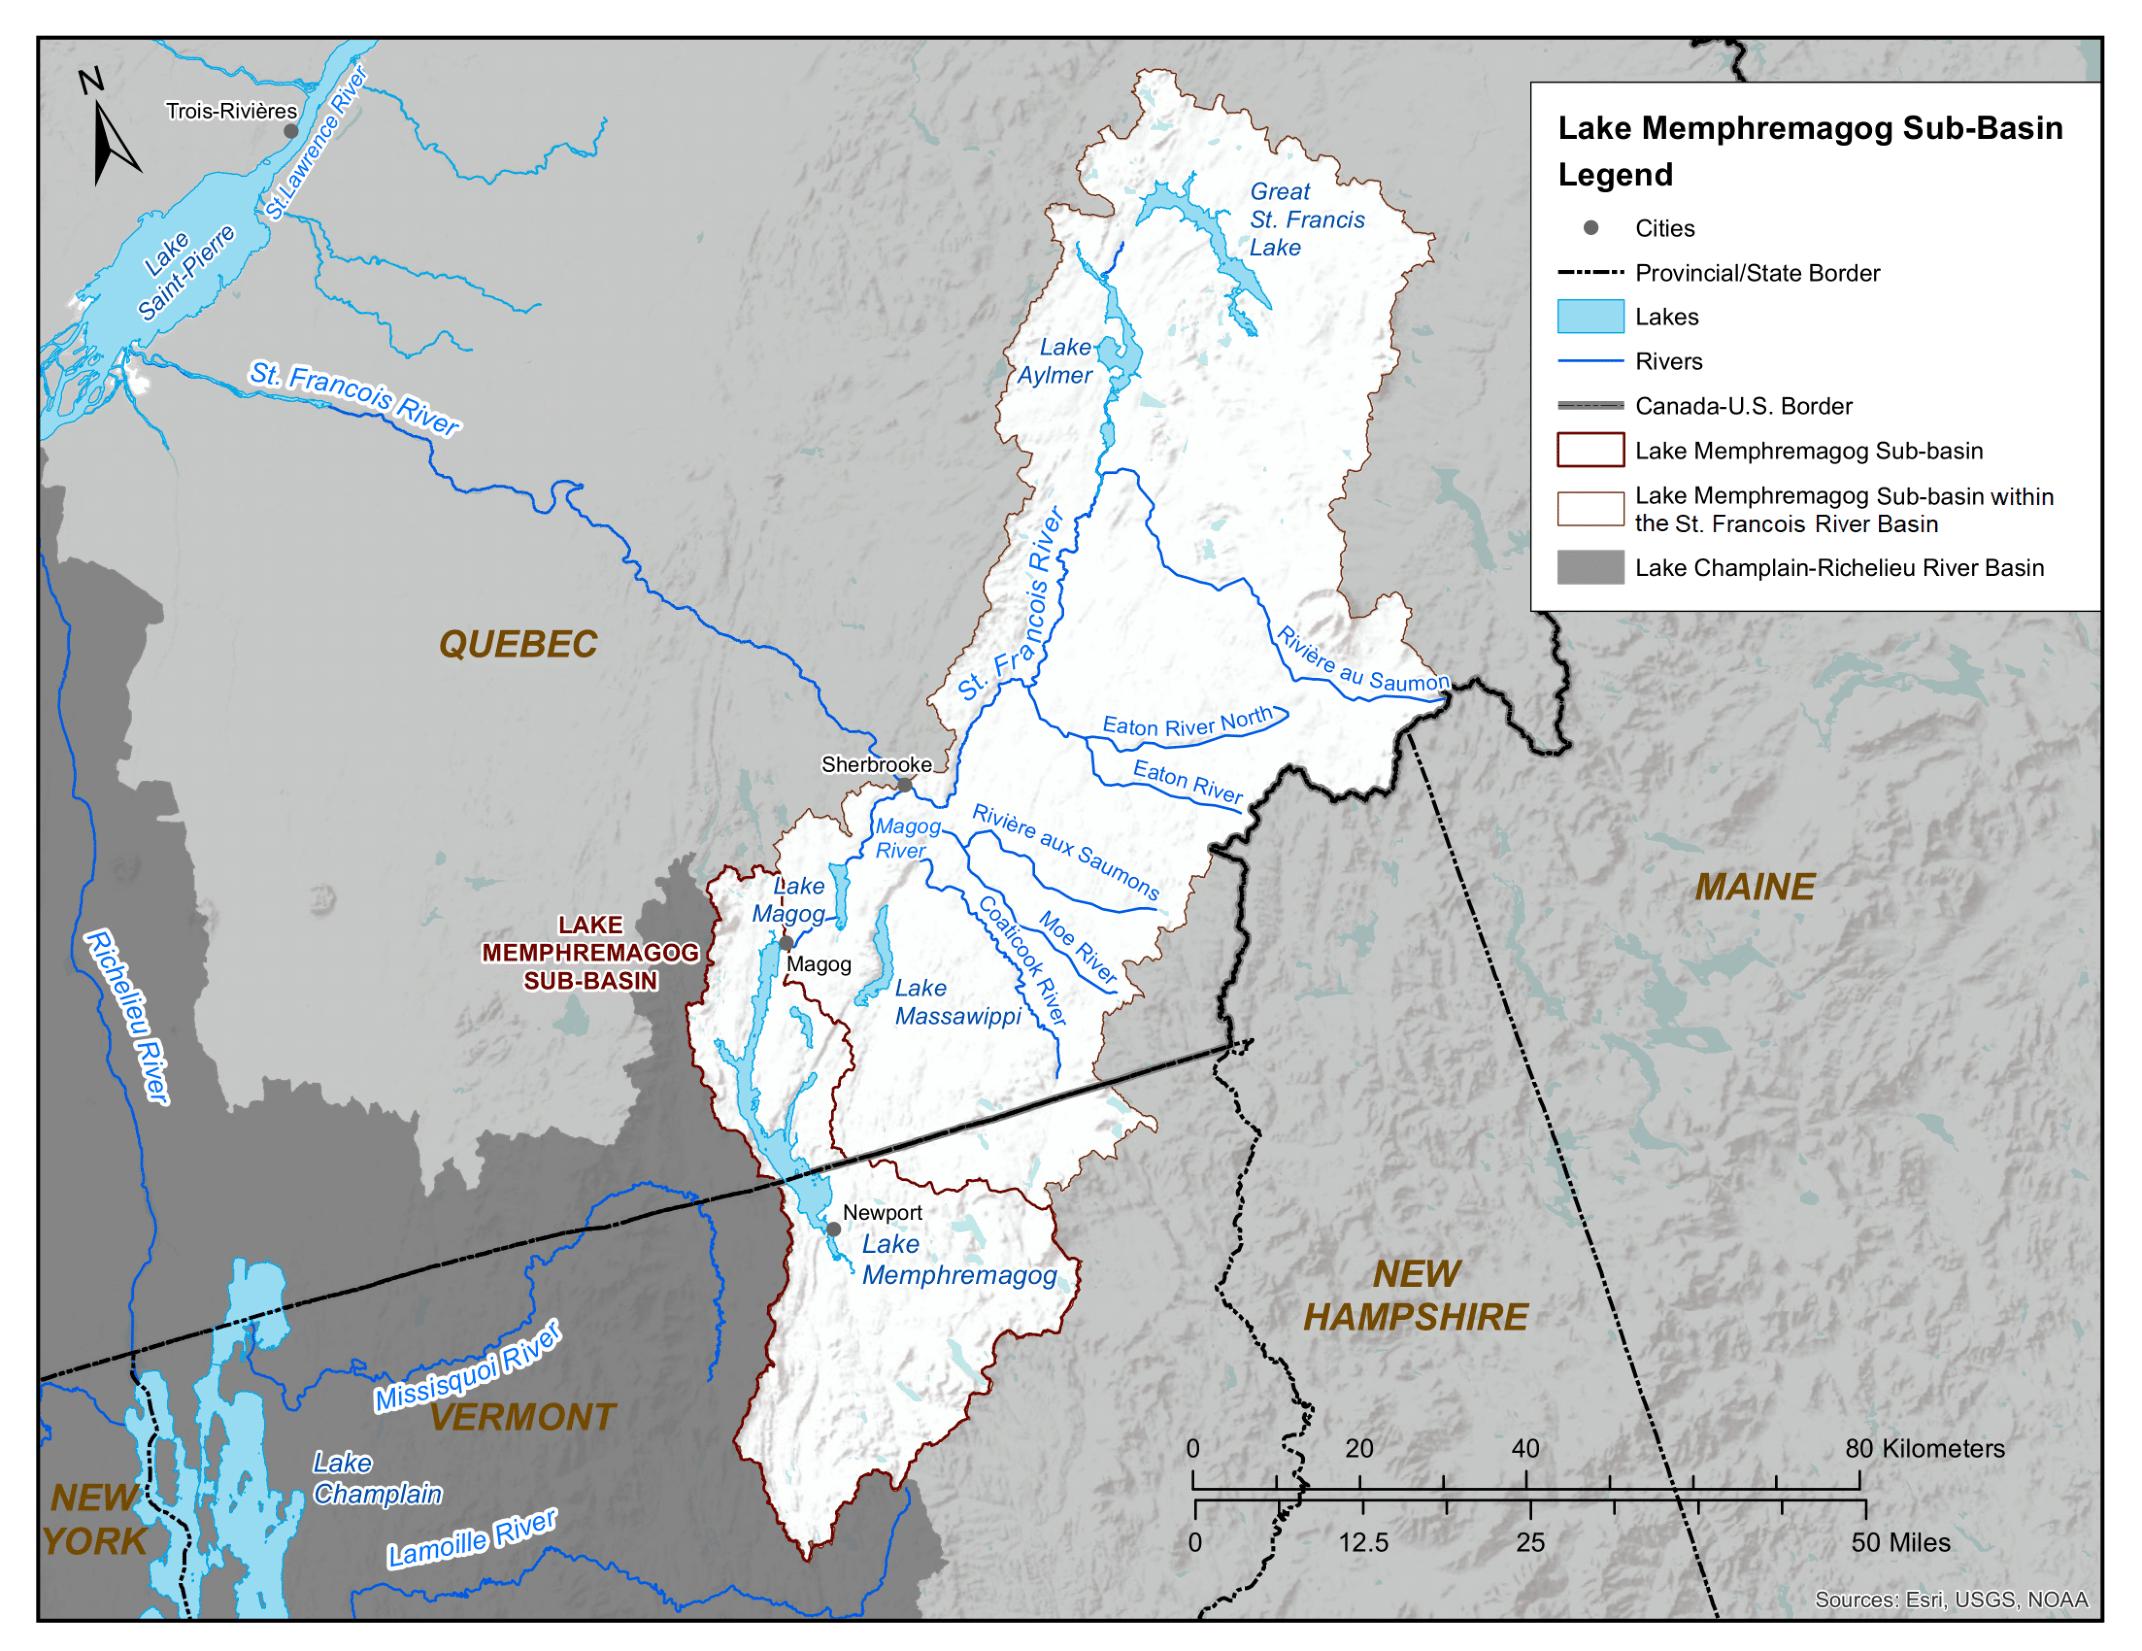 Map of Lake Memphremagog